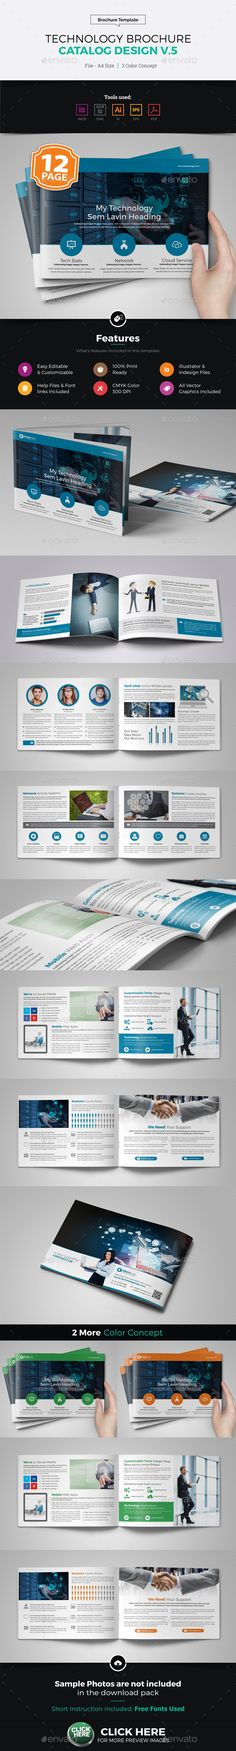 Technology Brochure Catalog Template v3 Download, Template and Vs - technology brochure template